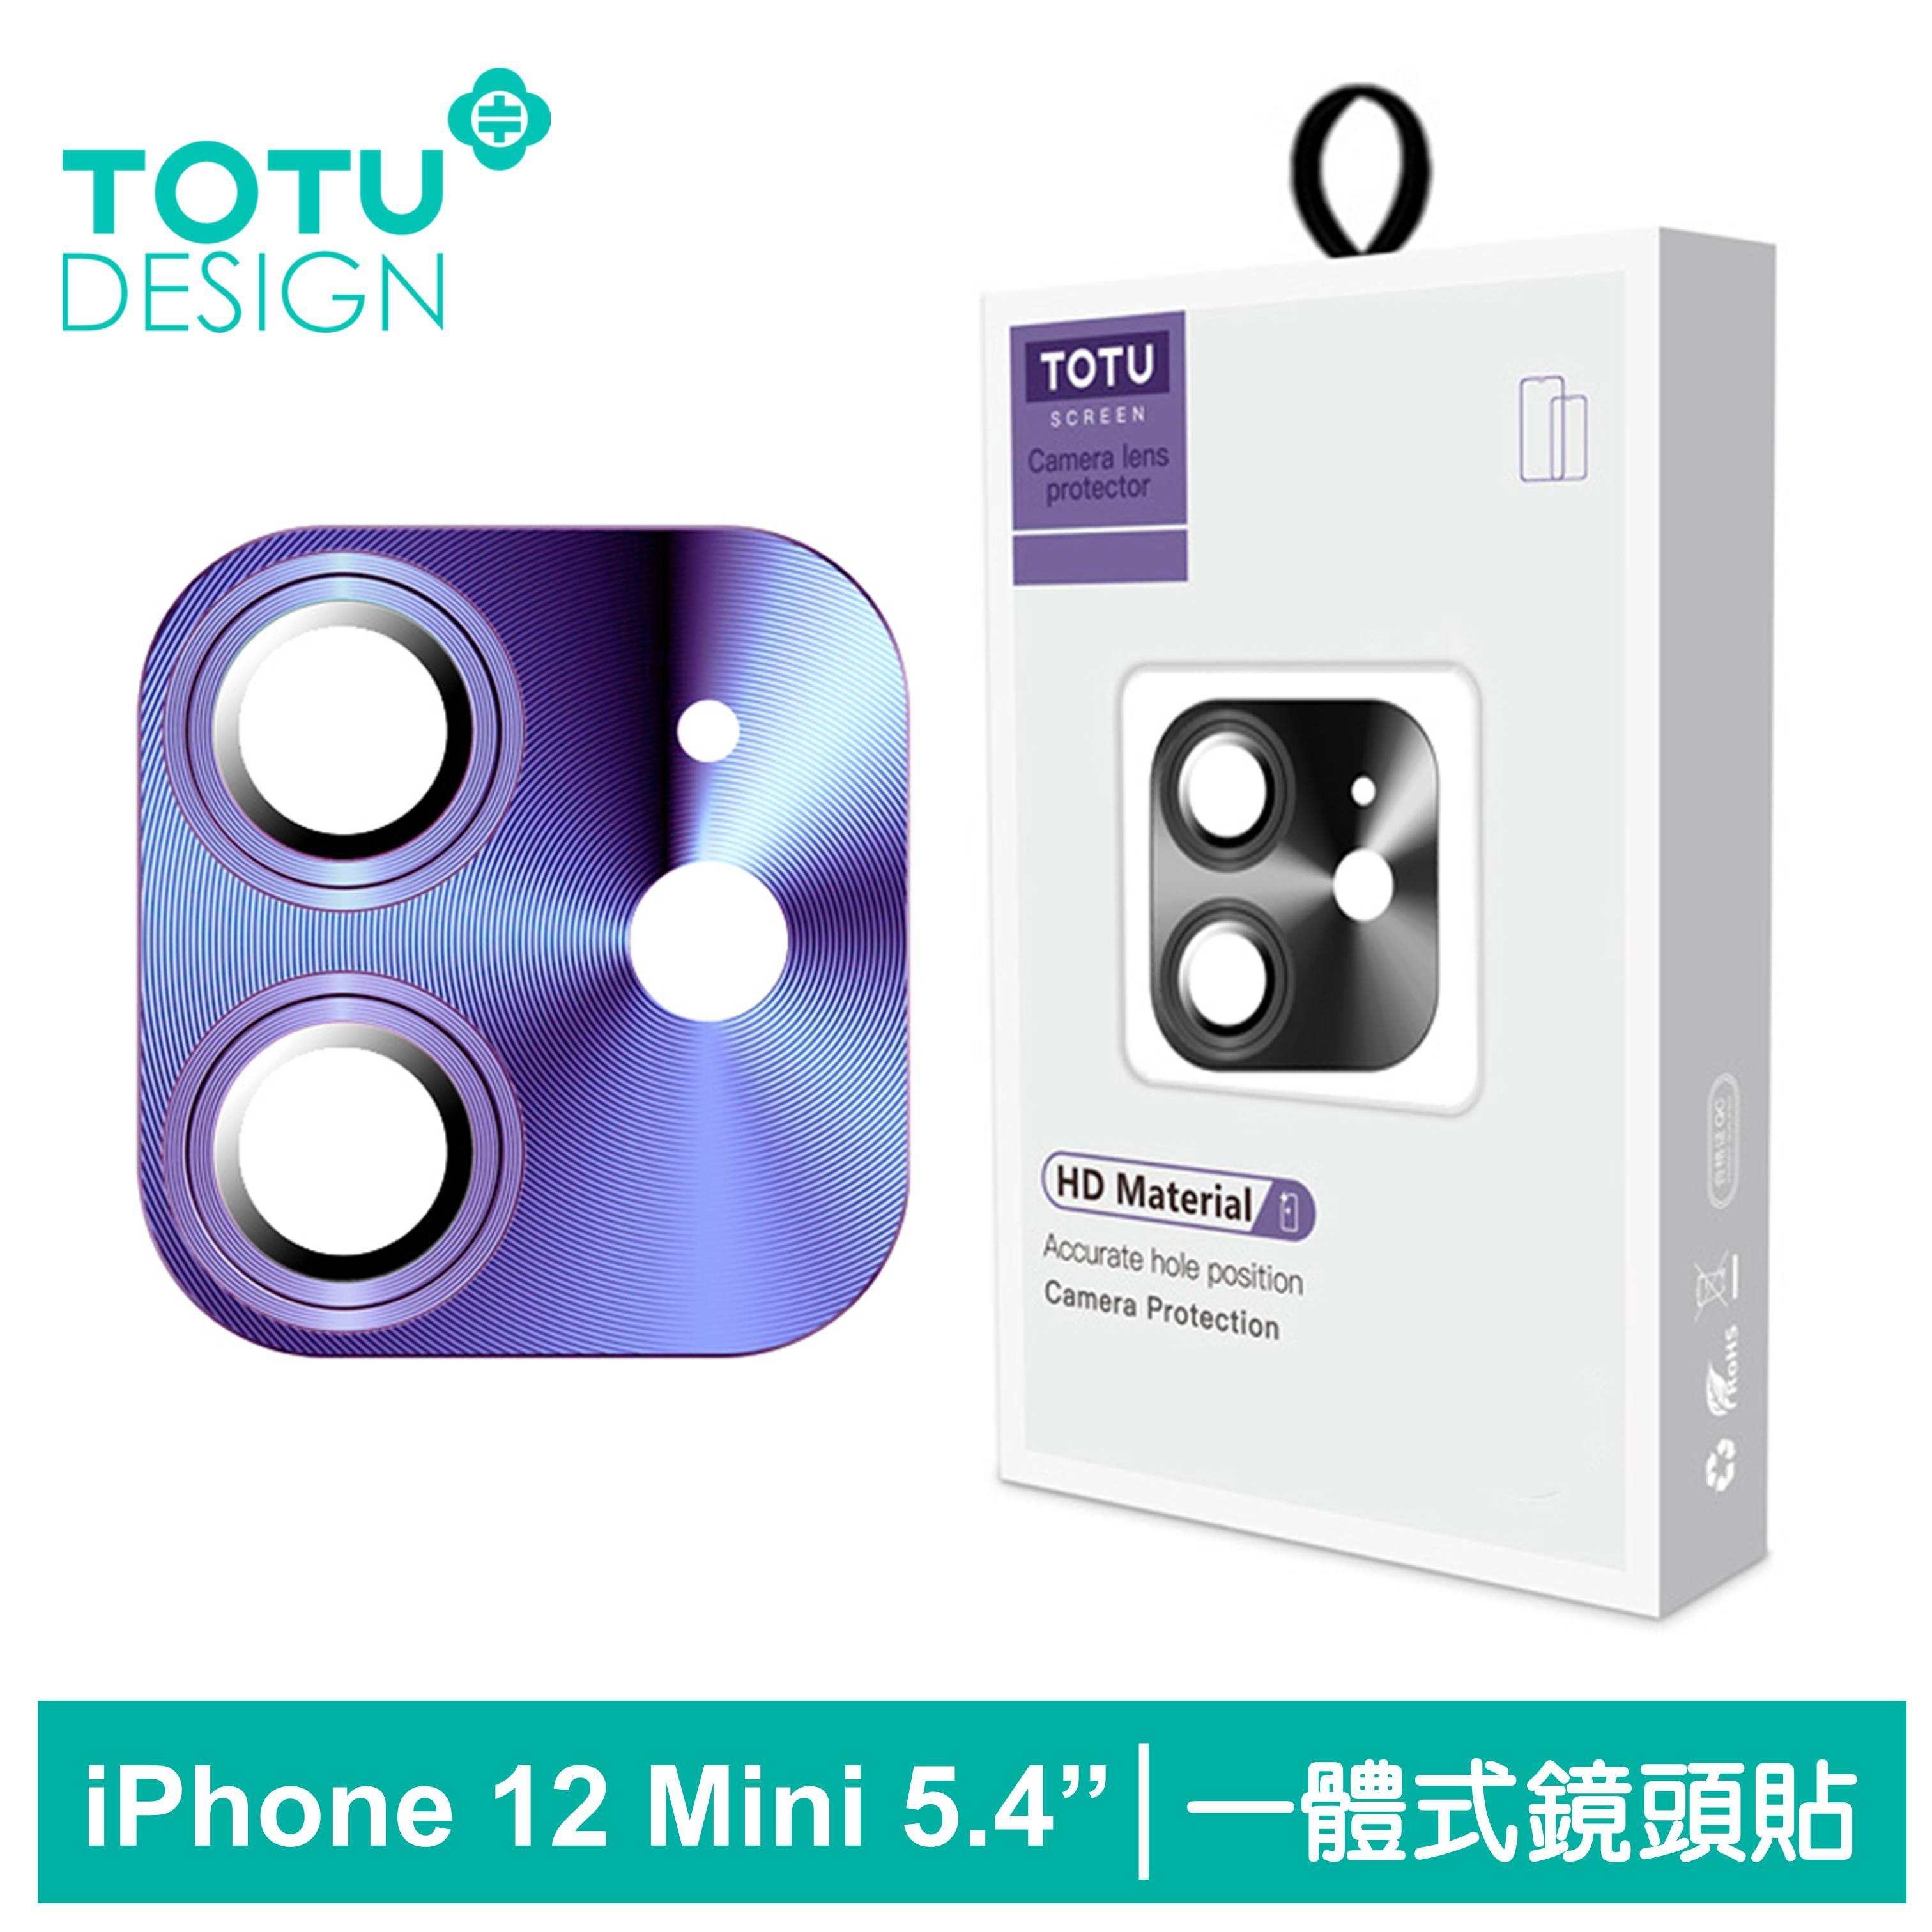 TOTU台灣官方 iPhone 12 Mini 鏡頭貼 i12 Mini 5.4吋 鋼化膜 保護貼 一體式鋁合金鋼化玻璃 鎧甲系列 紫色